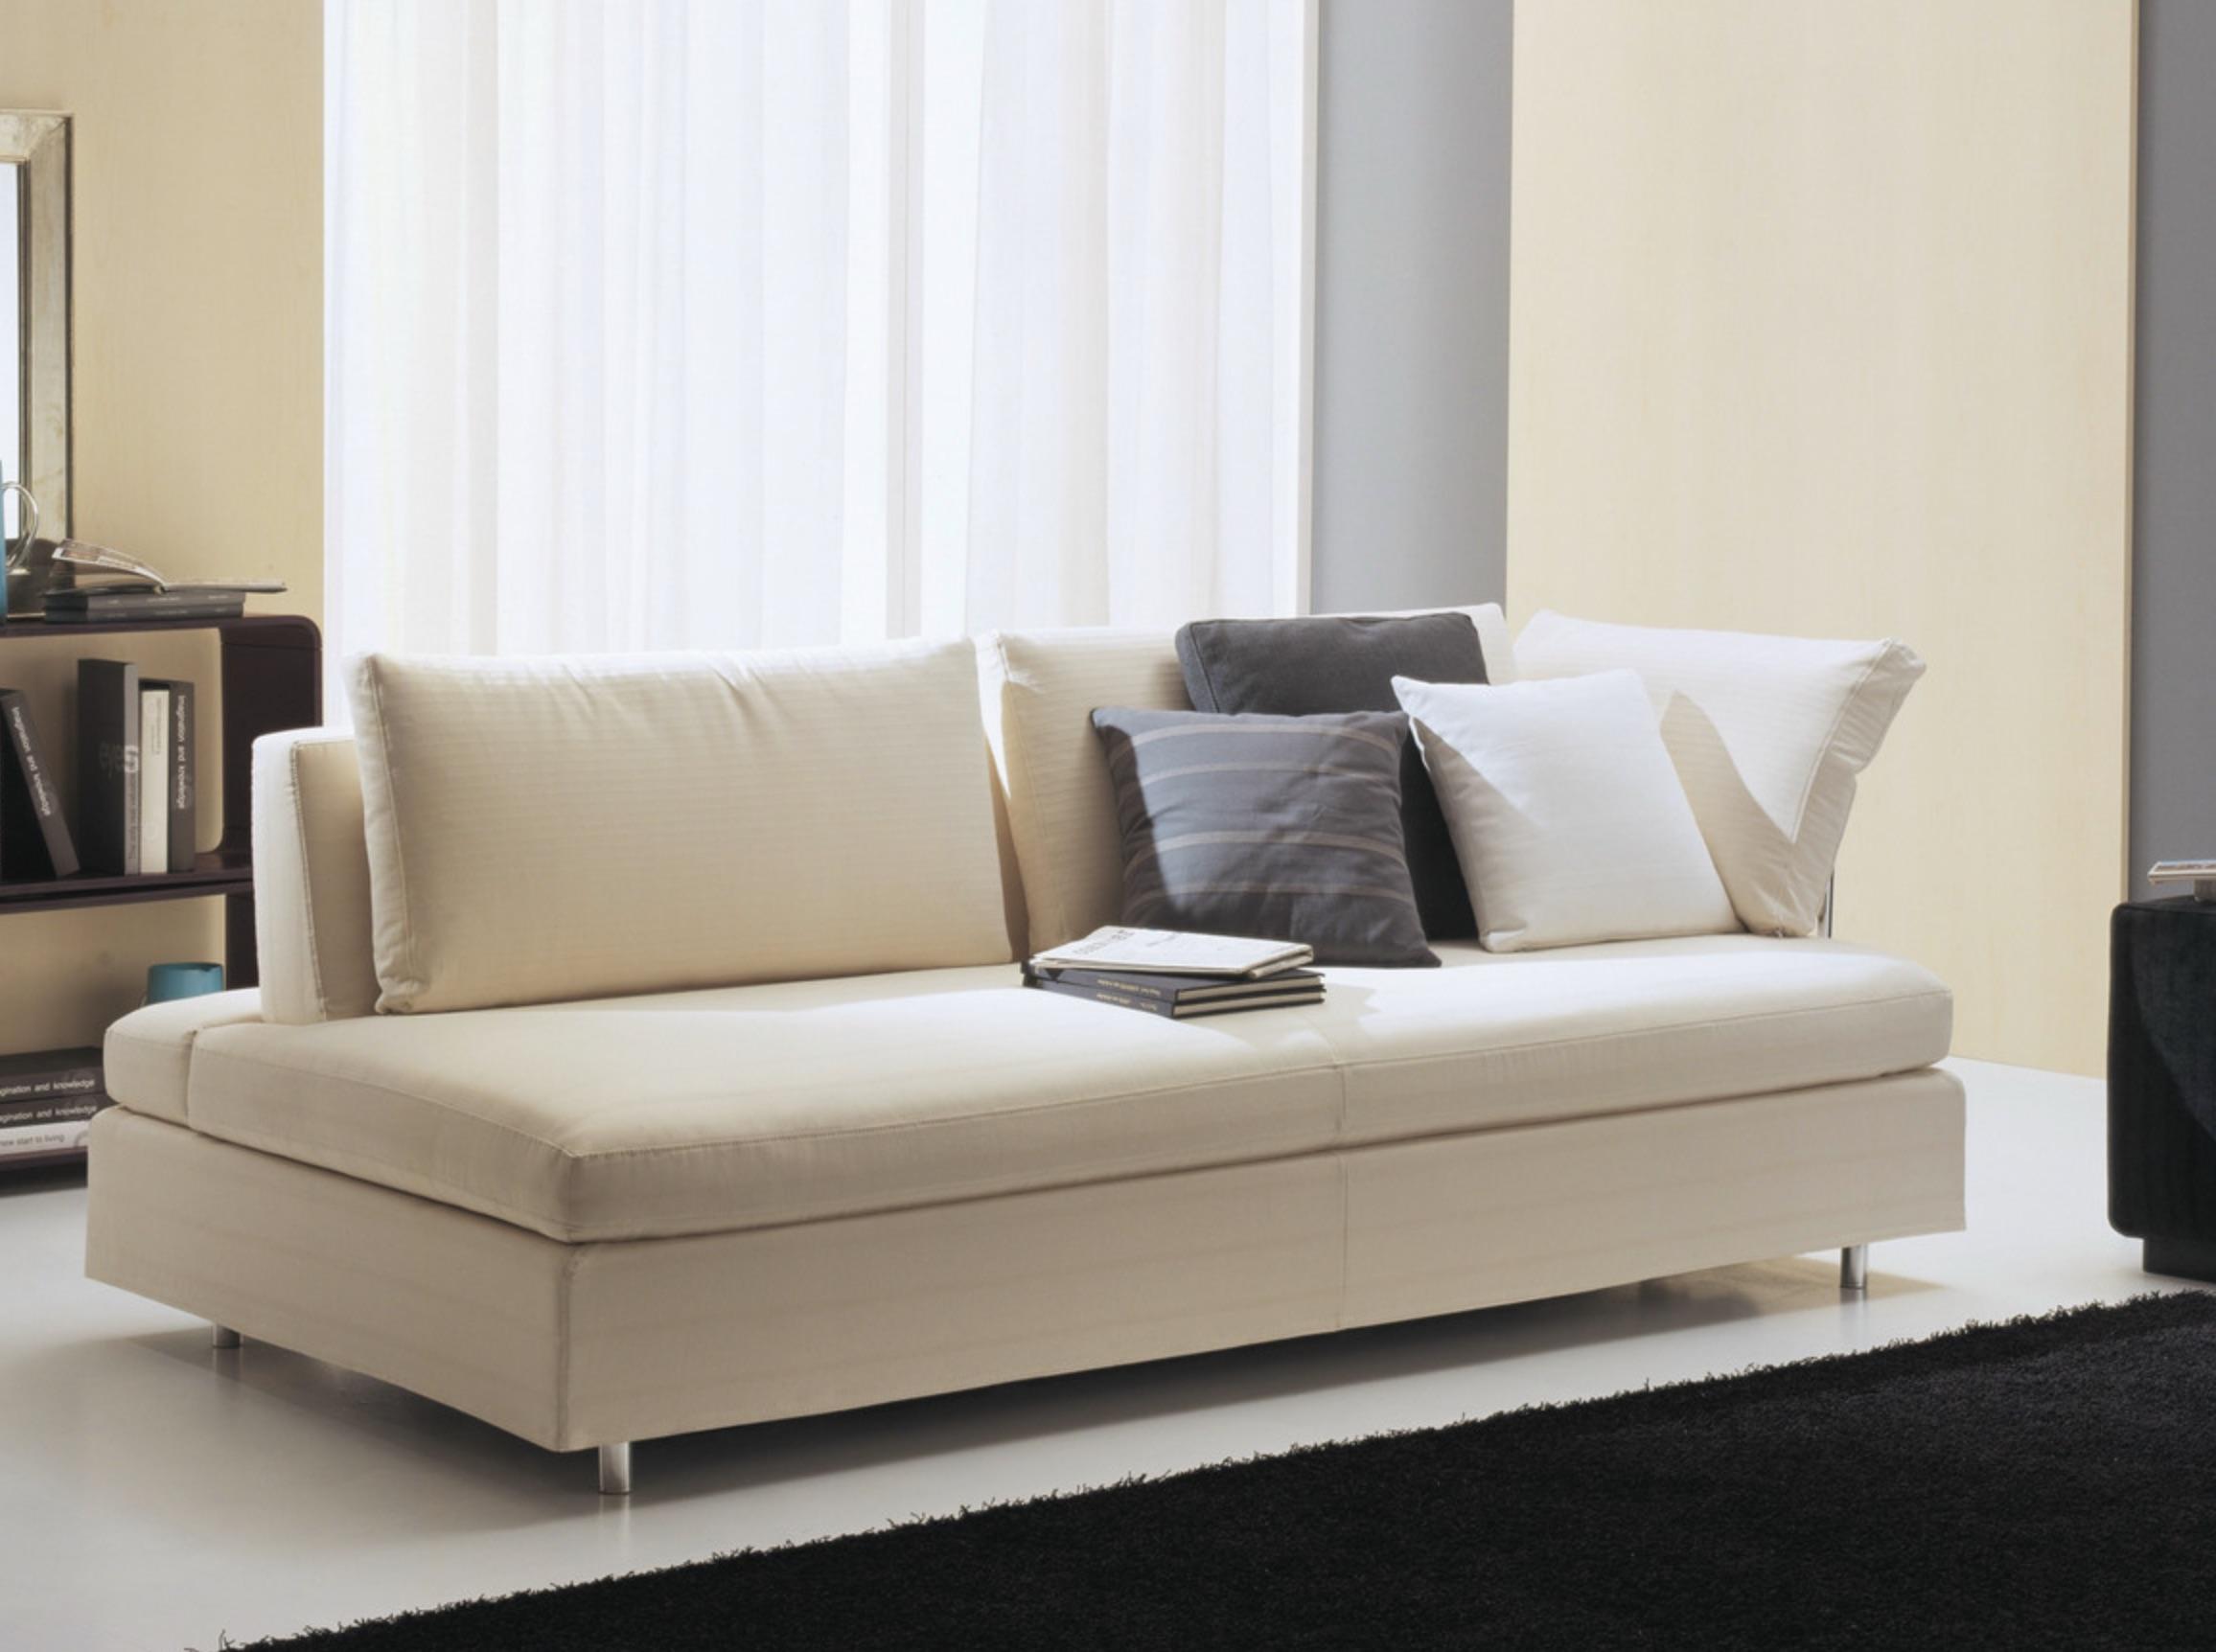 SBD 110 Modern Sofa Beds